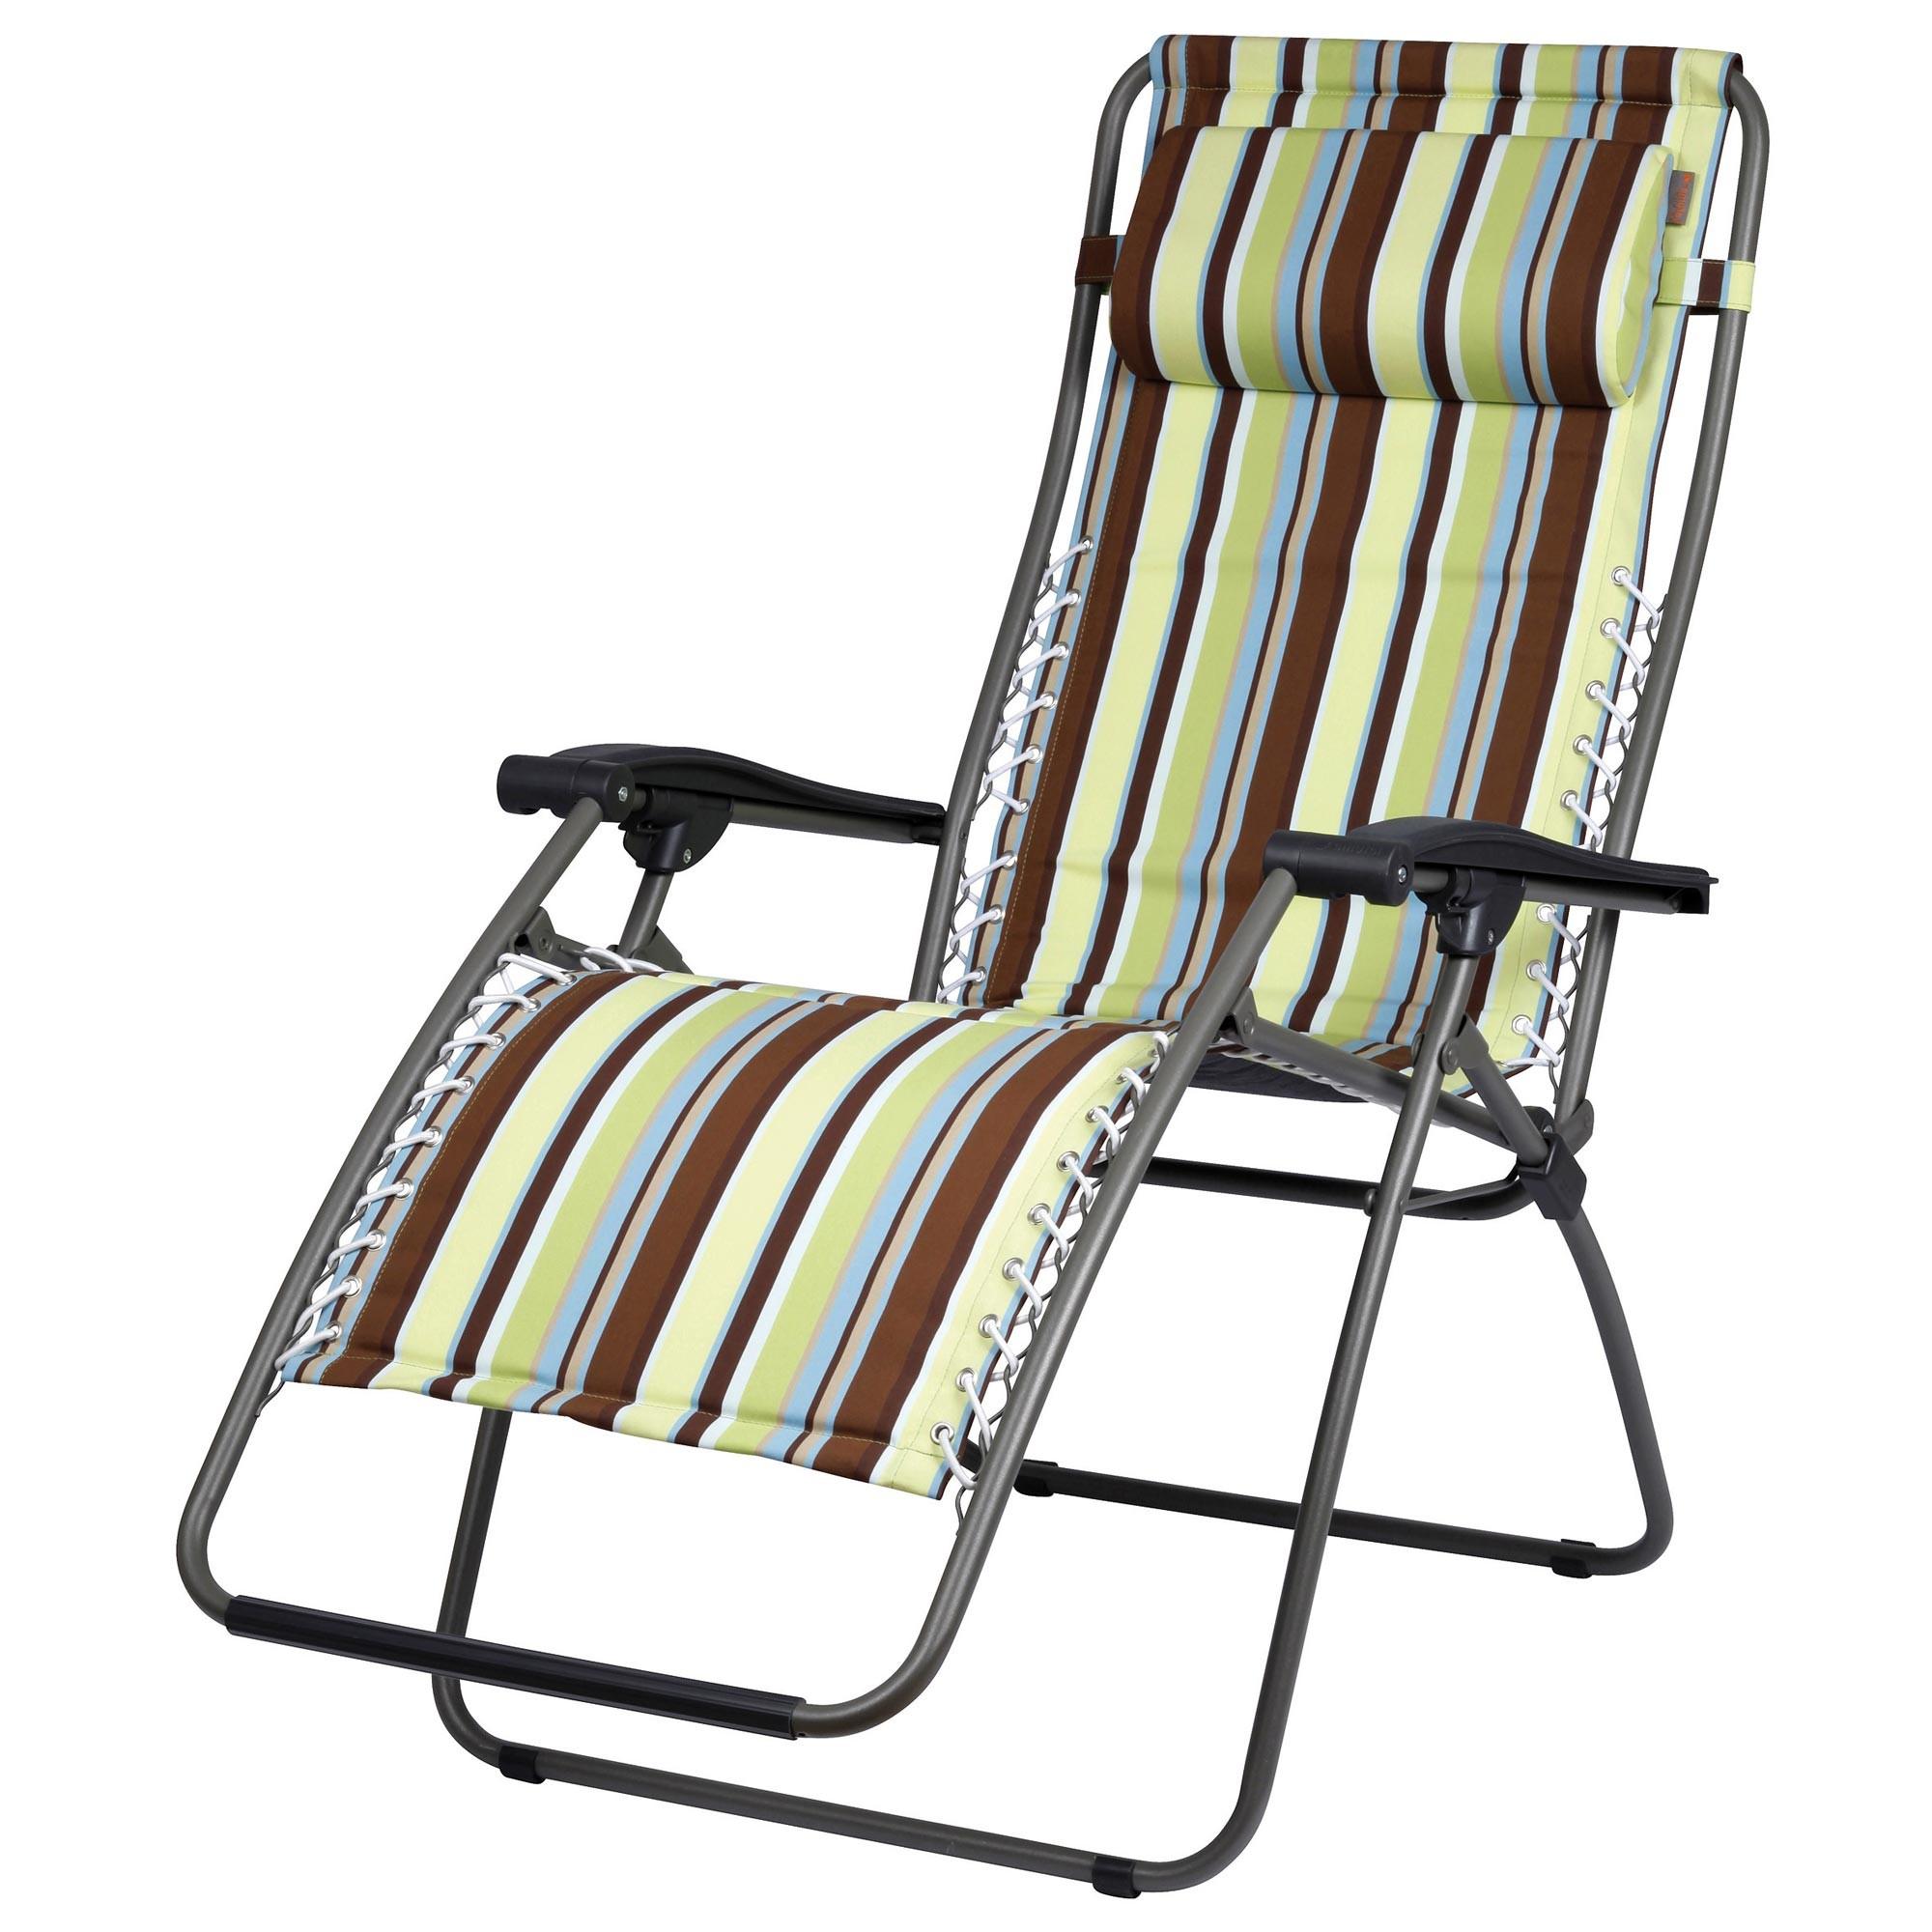 Chaise Relax Pliante Pas Cher